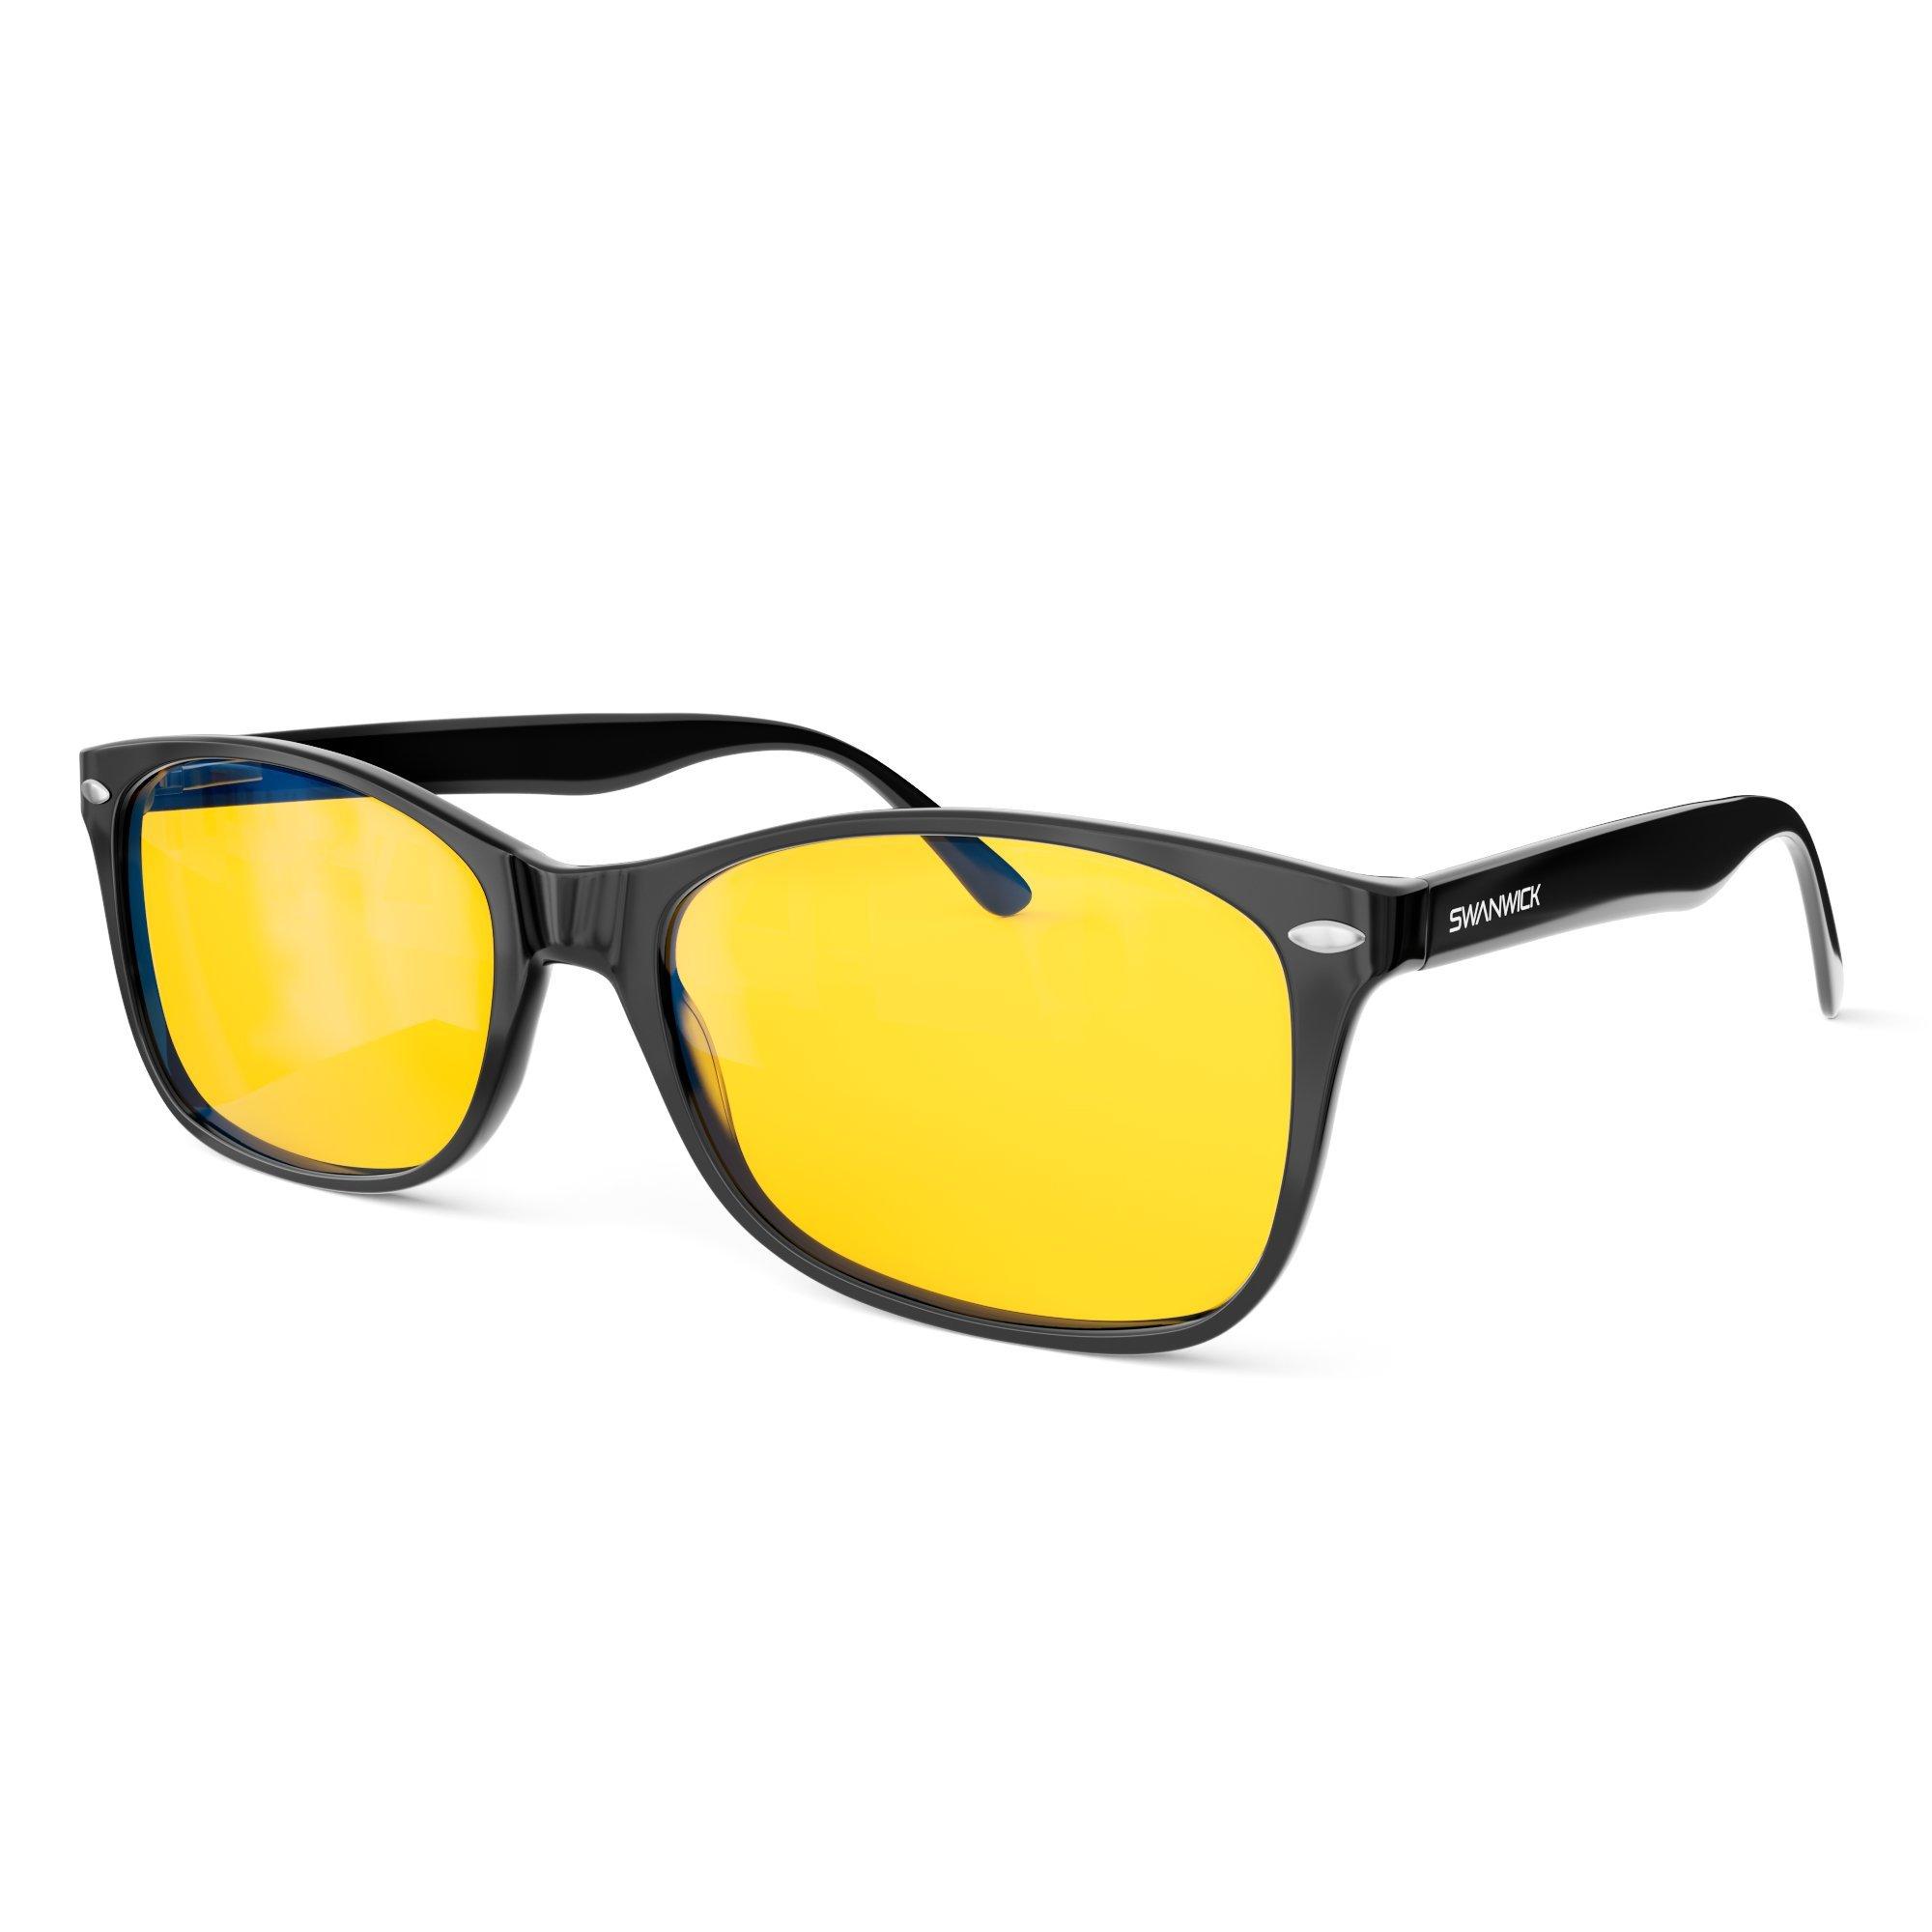 Blue Light Blocking Glasses – Swannies Gamer and Computer Eyewear for Deep Sleep - Digital Eye Strain Prevention - FDA Registered Company - Swanwick Sleep